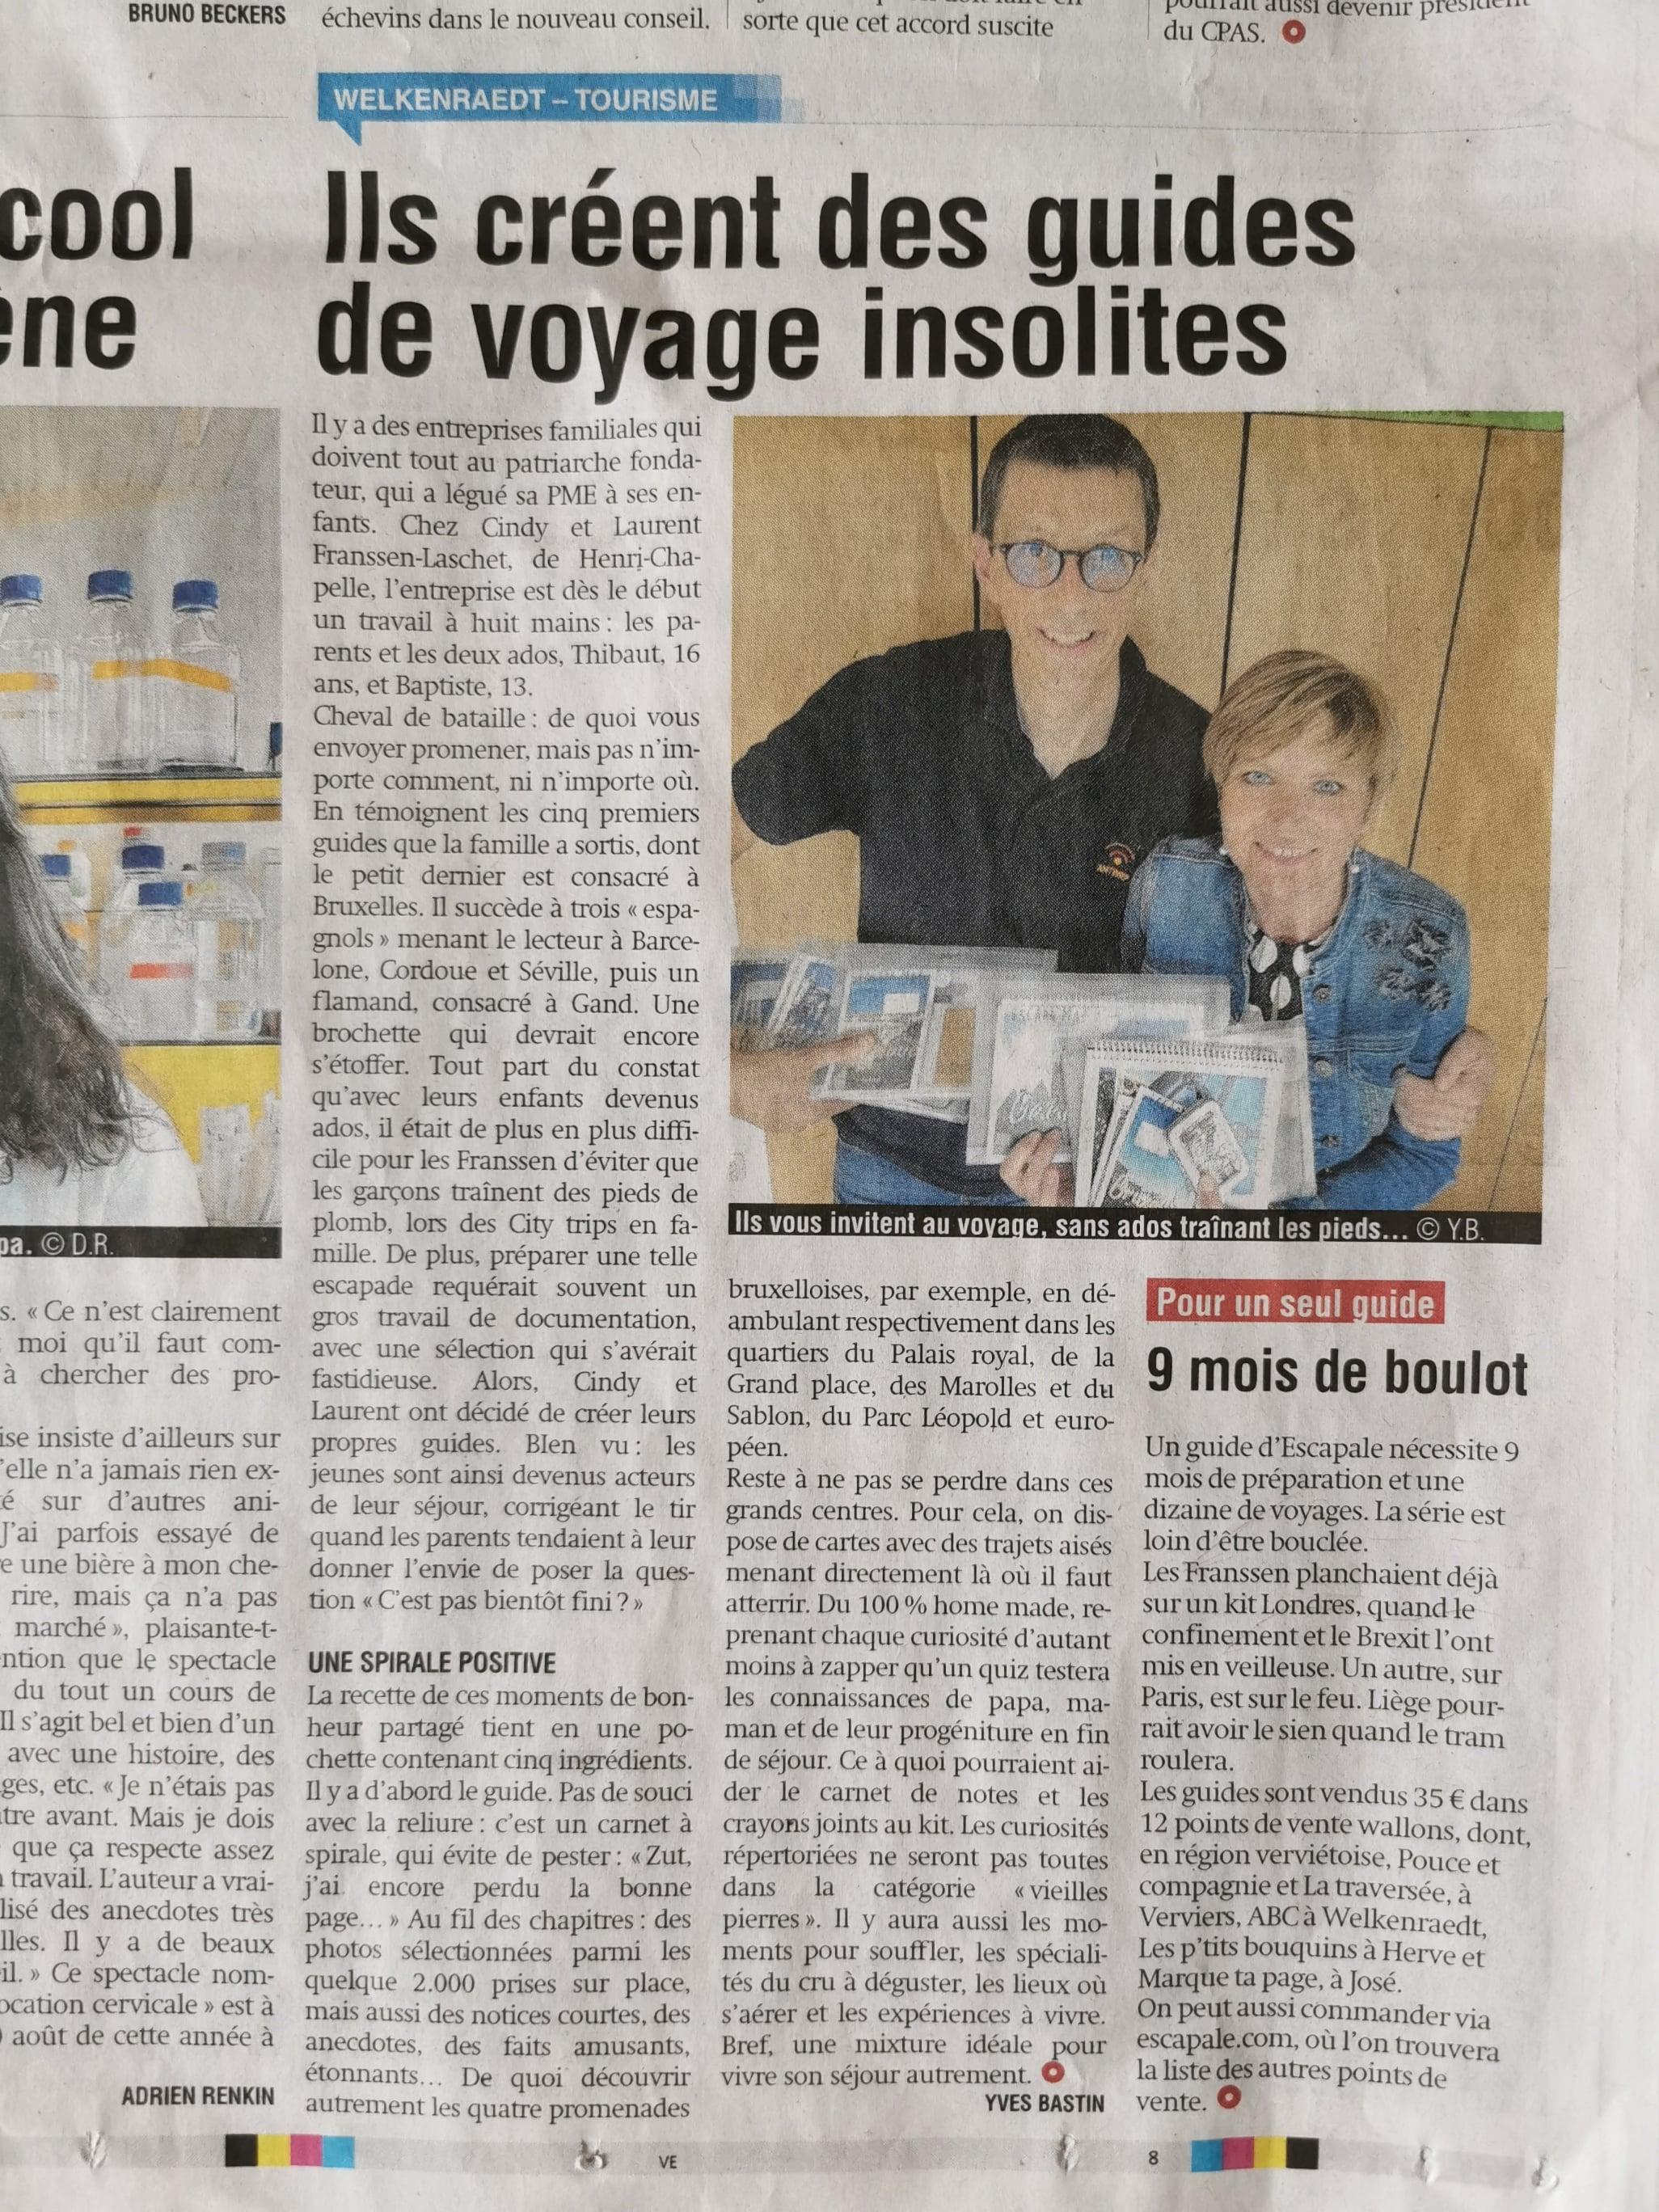 Article de presse La Meuse 22/06/2021